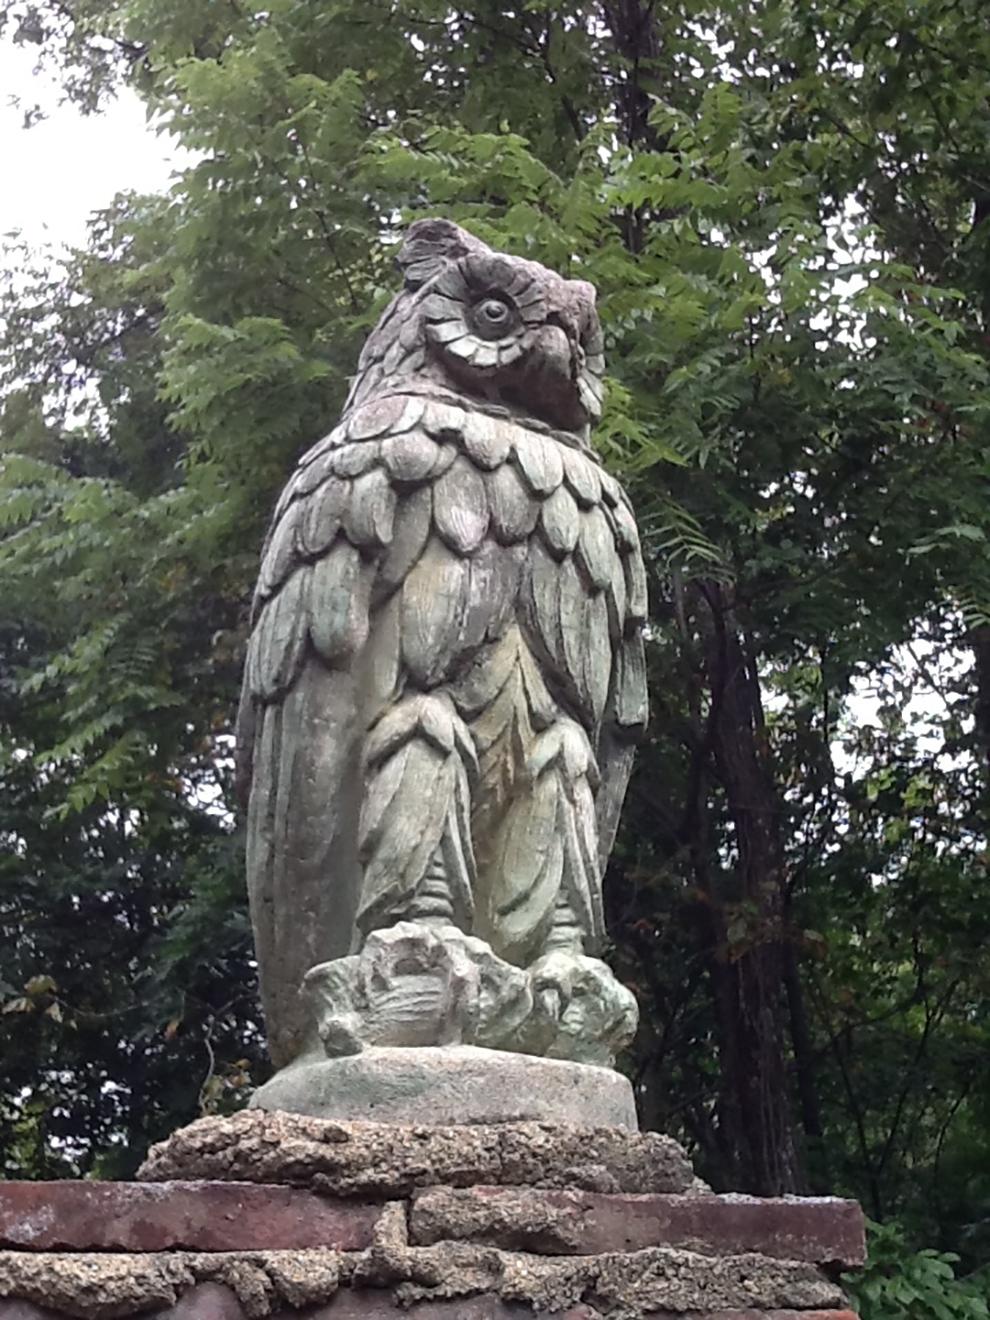 Guardian owl at Inniswood's Secret Garden